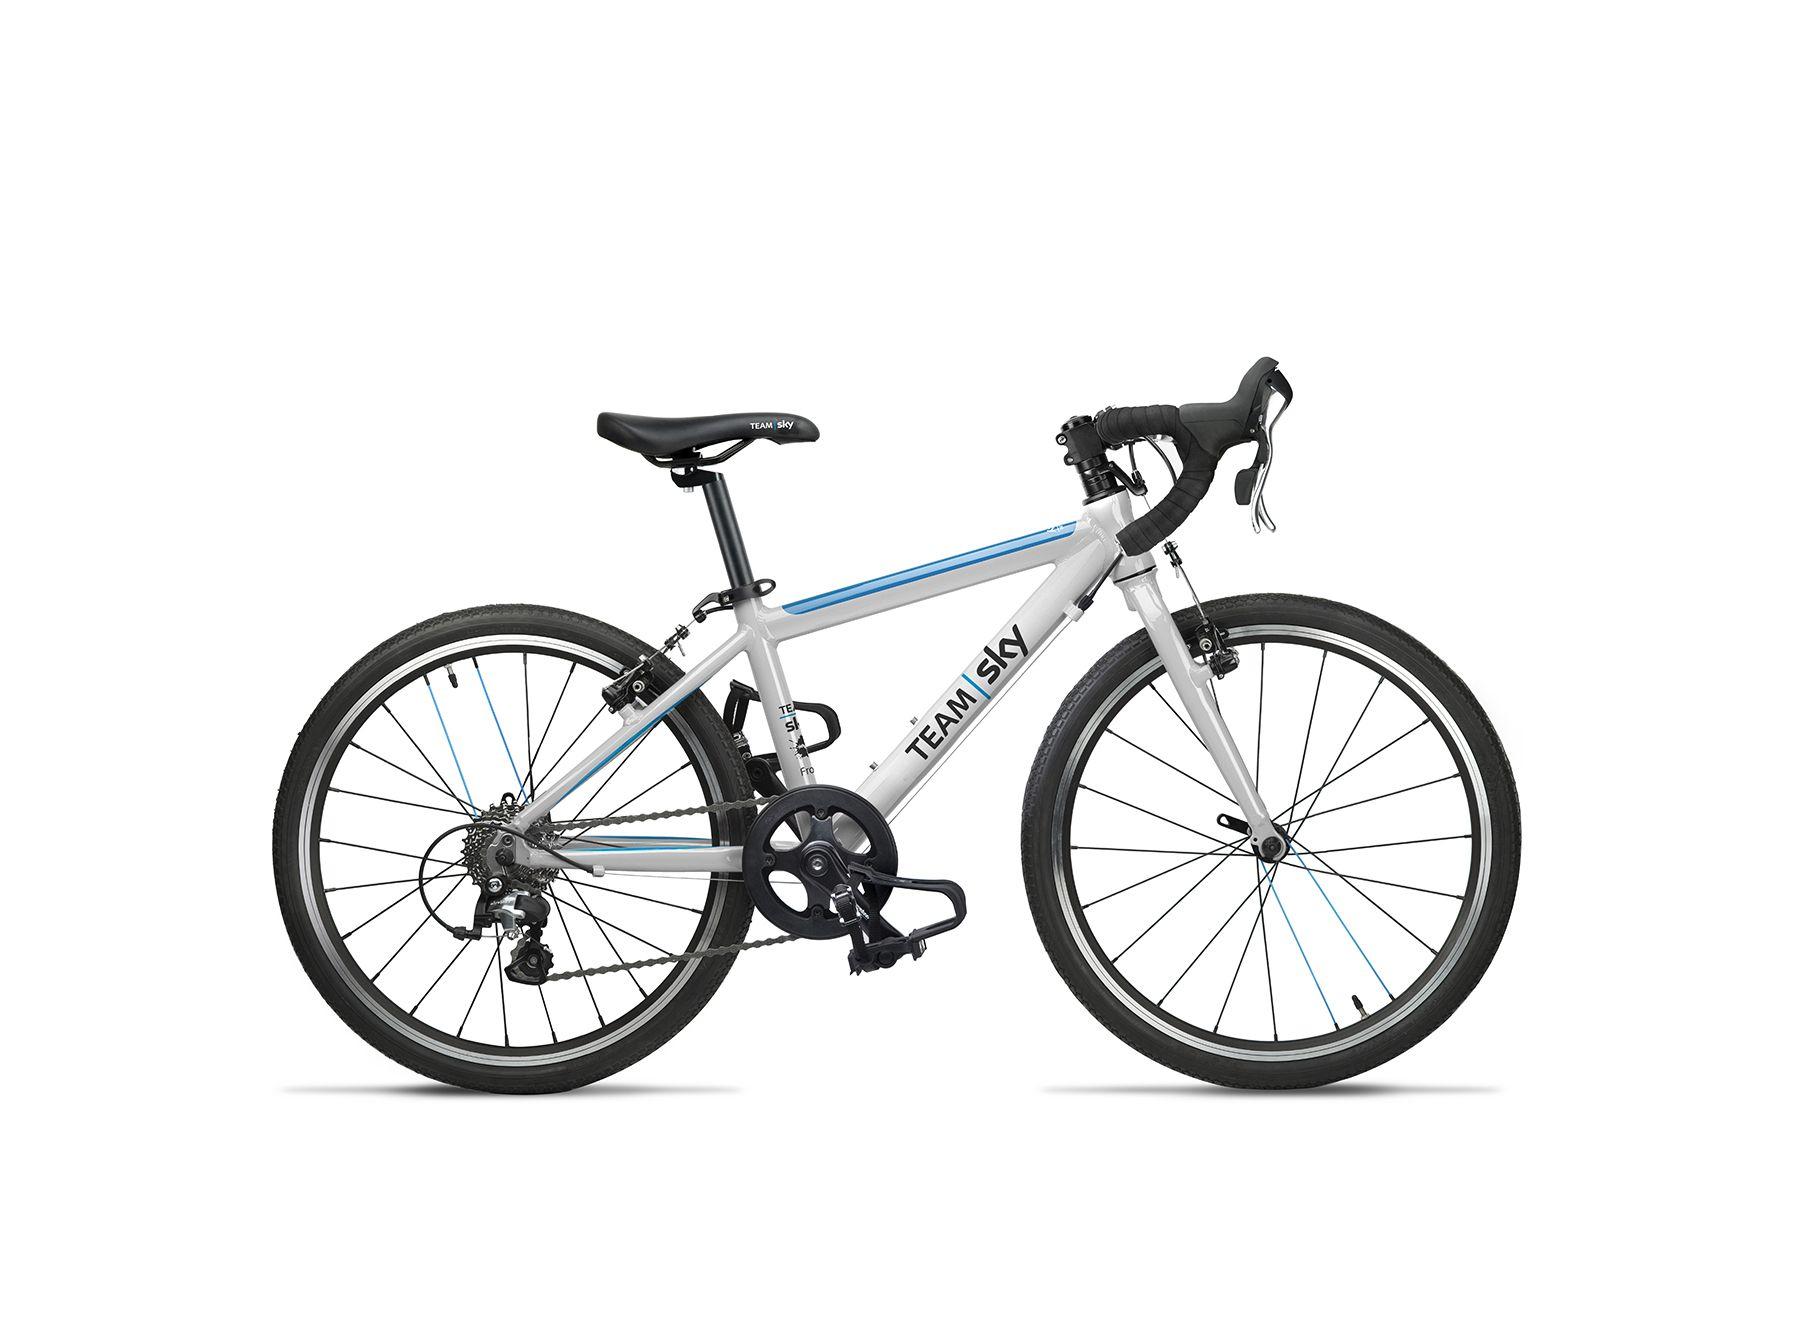 Vélo route enfant Frog Bikes Road 58 Blanc/Bleu Team Sky